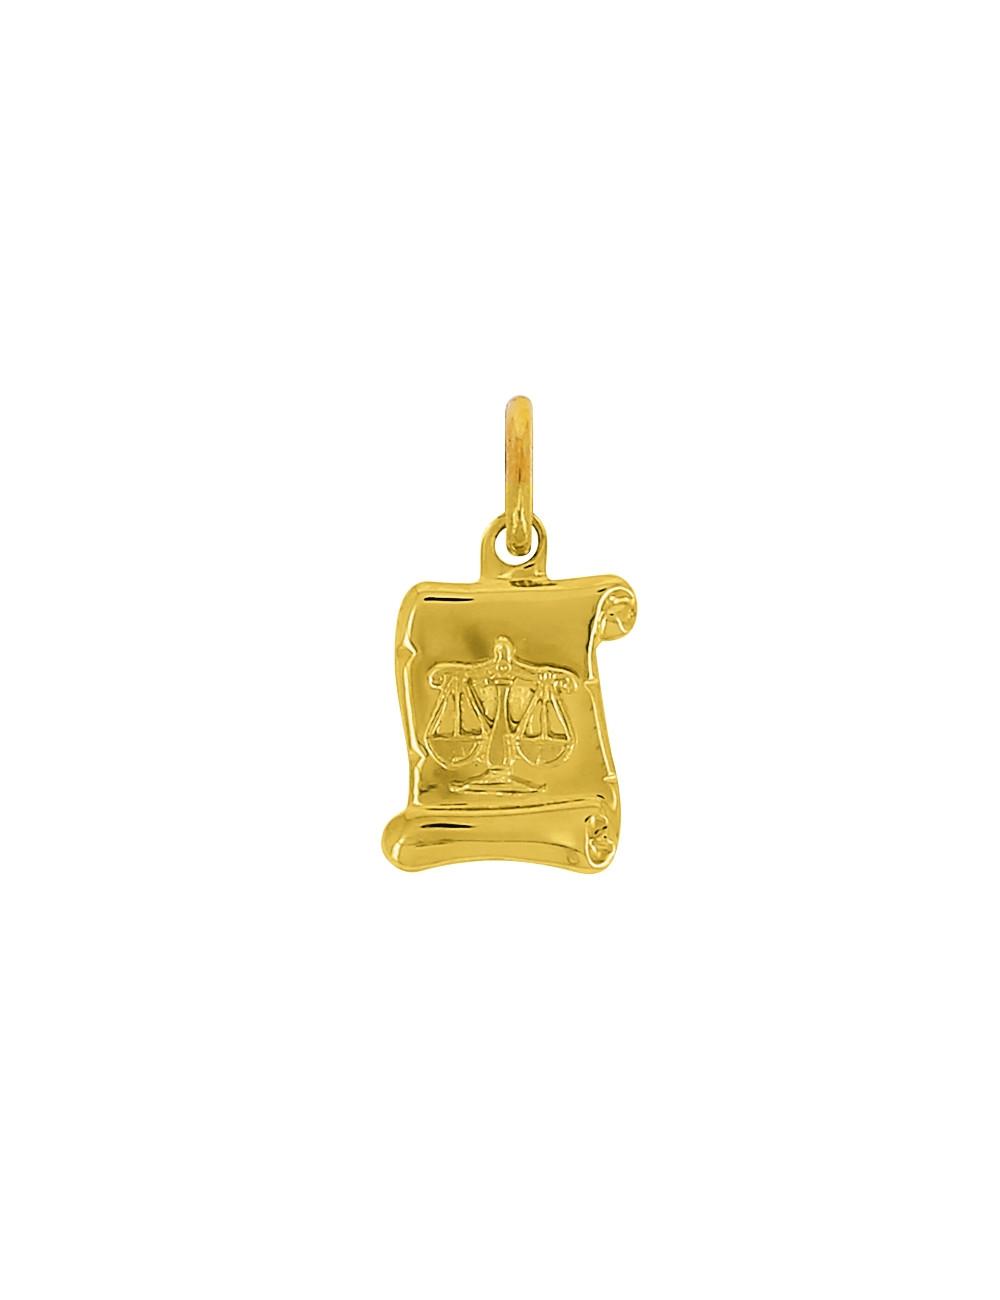 Pendentif Signe Du Zodiaque Balance Or Jaune 18 Carats + Chaine Or Jaune 18 Carats Offerte